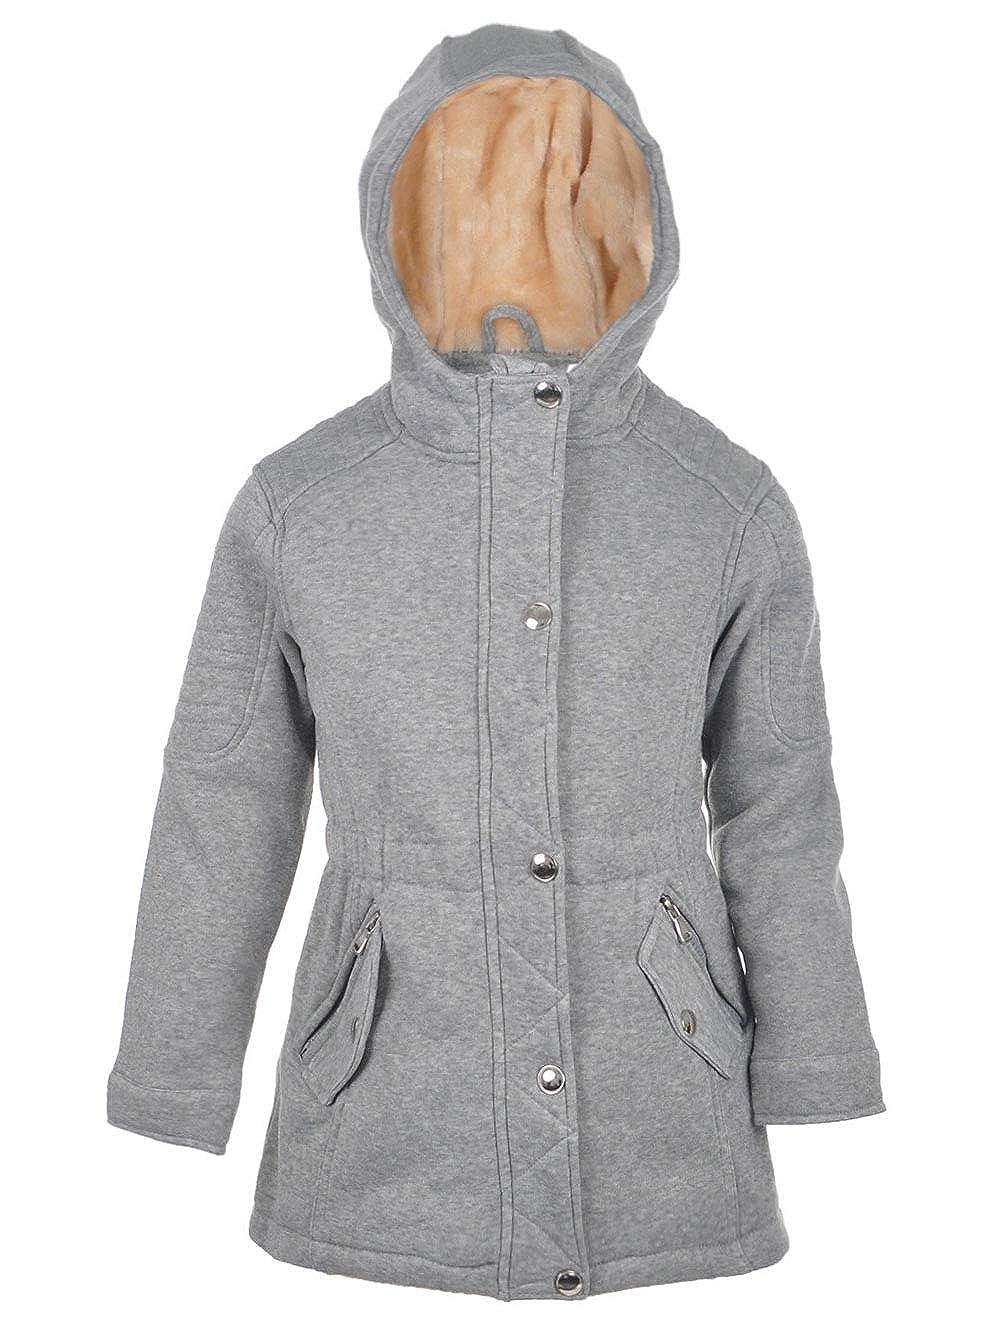 Urban Republic Girls' Hooded Jacket 14